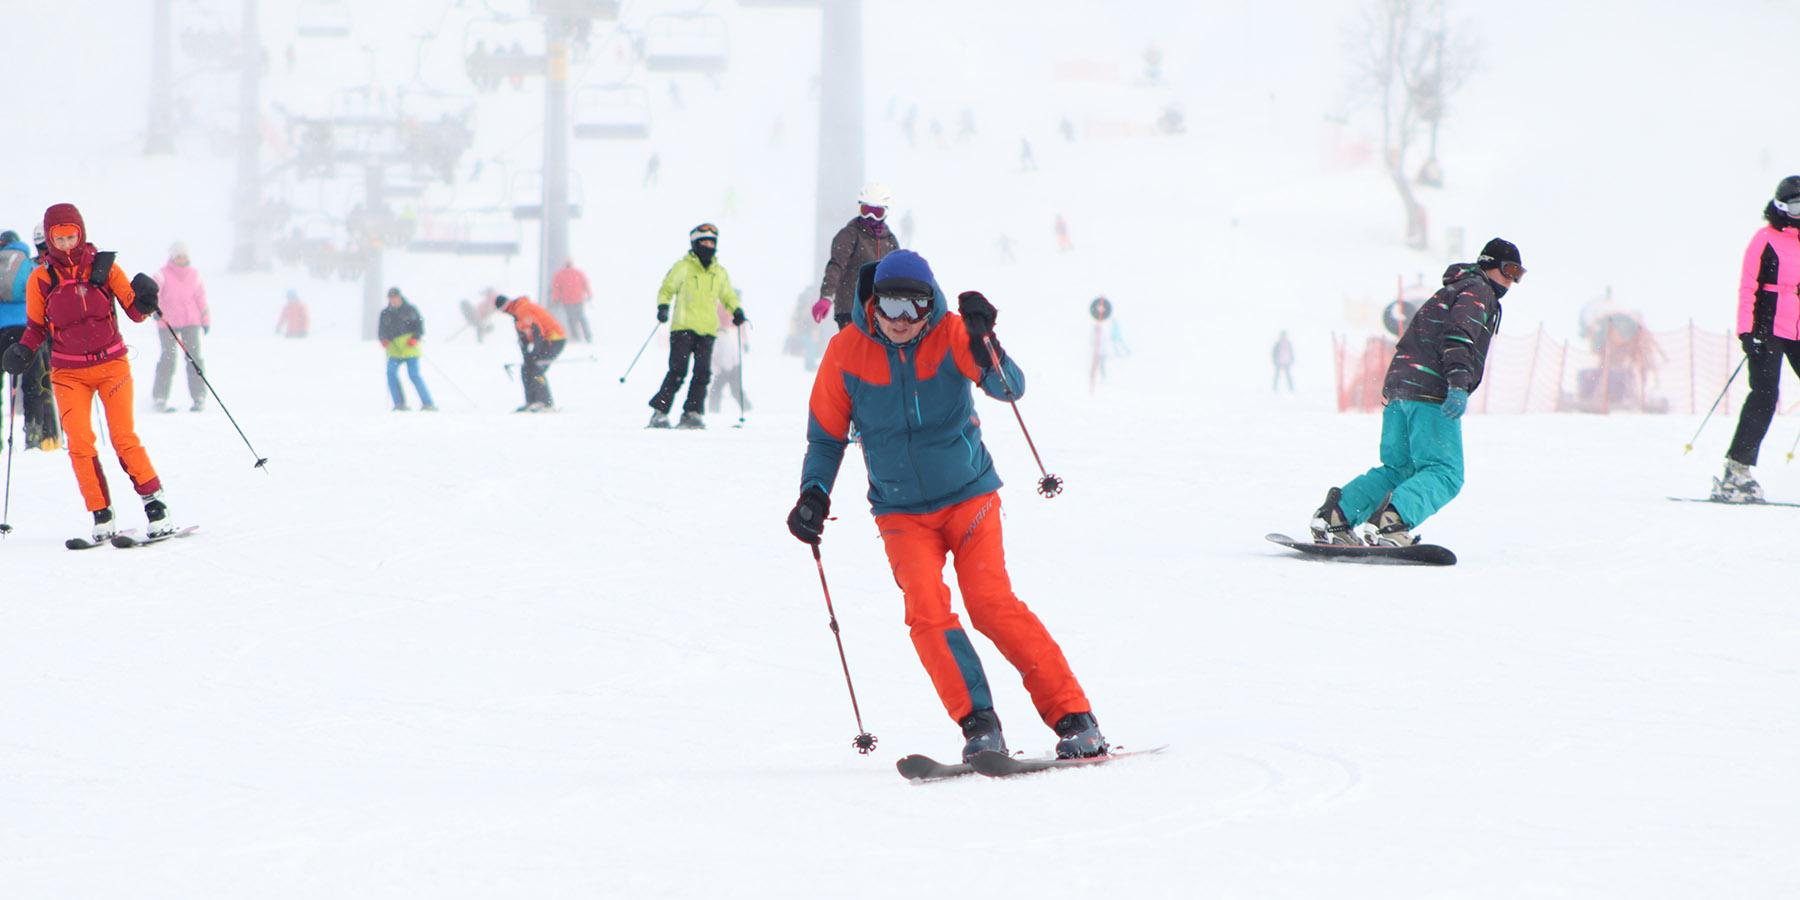 skiing to burn calories